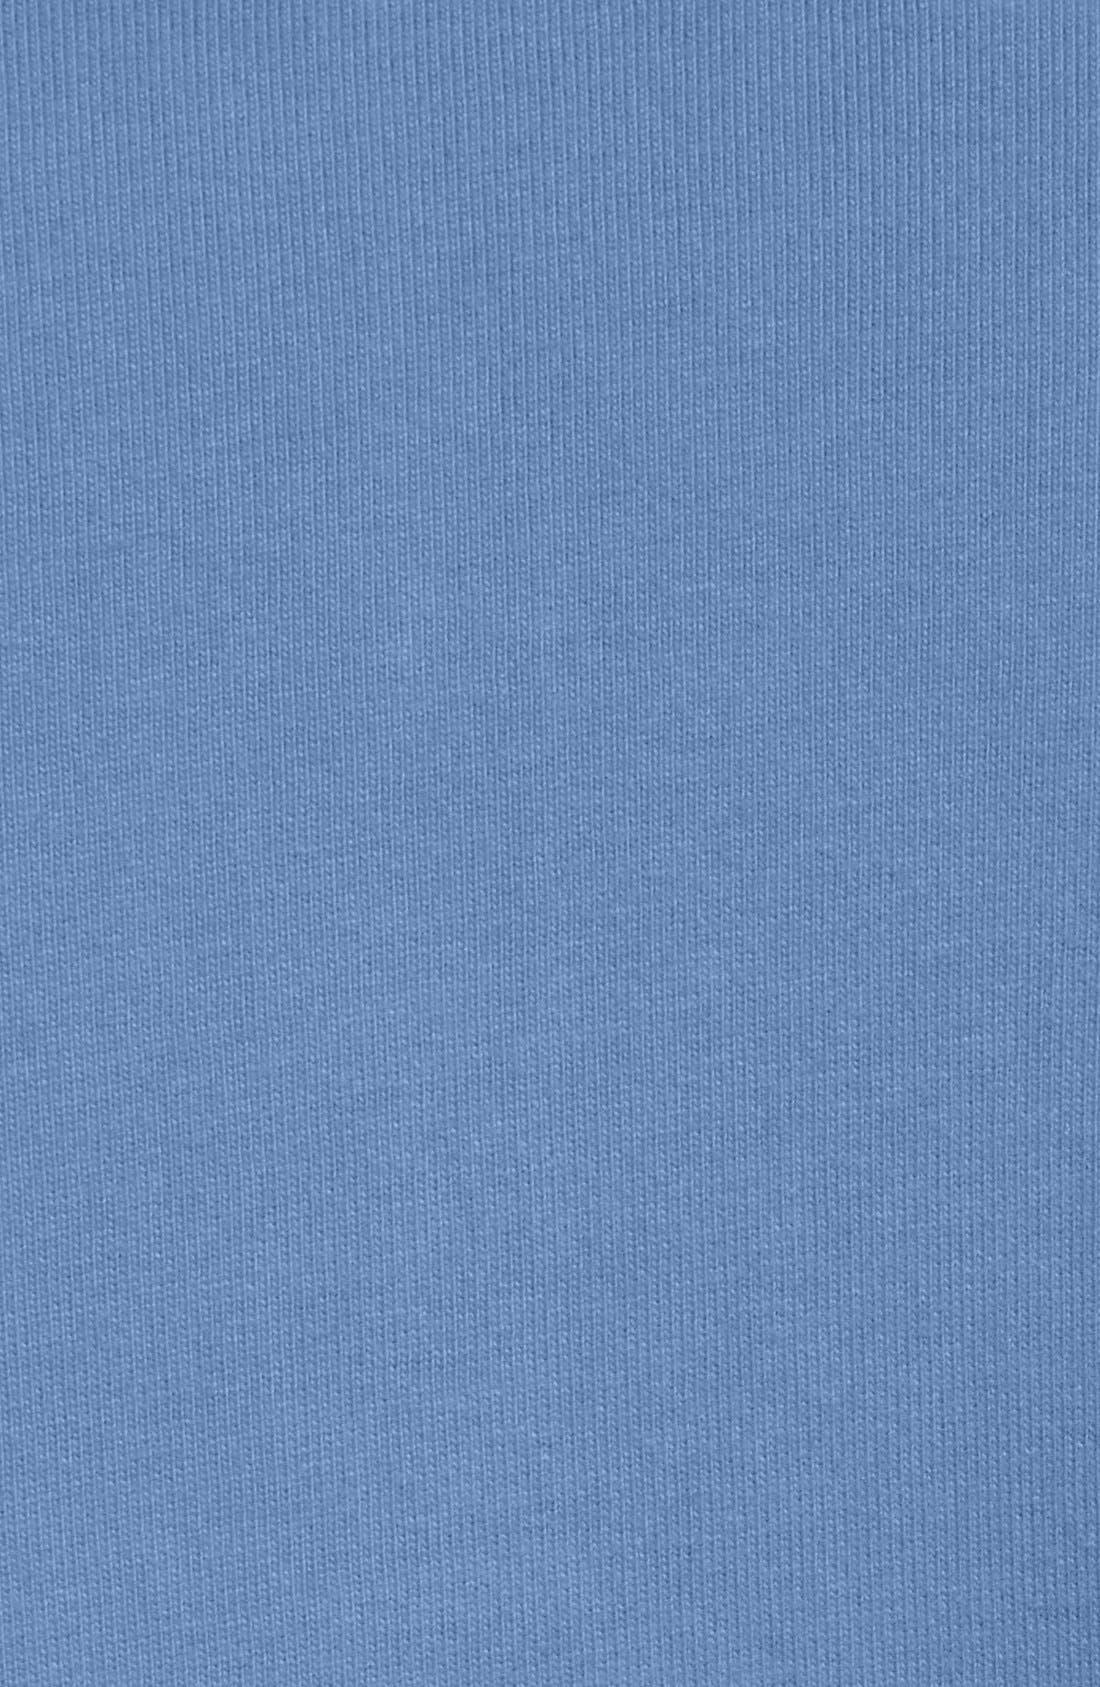 Alternate Image 3  - Nordstrom Quarter Zip Cotton Pullover